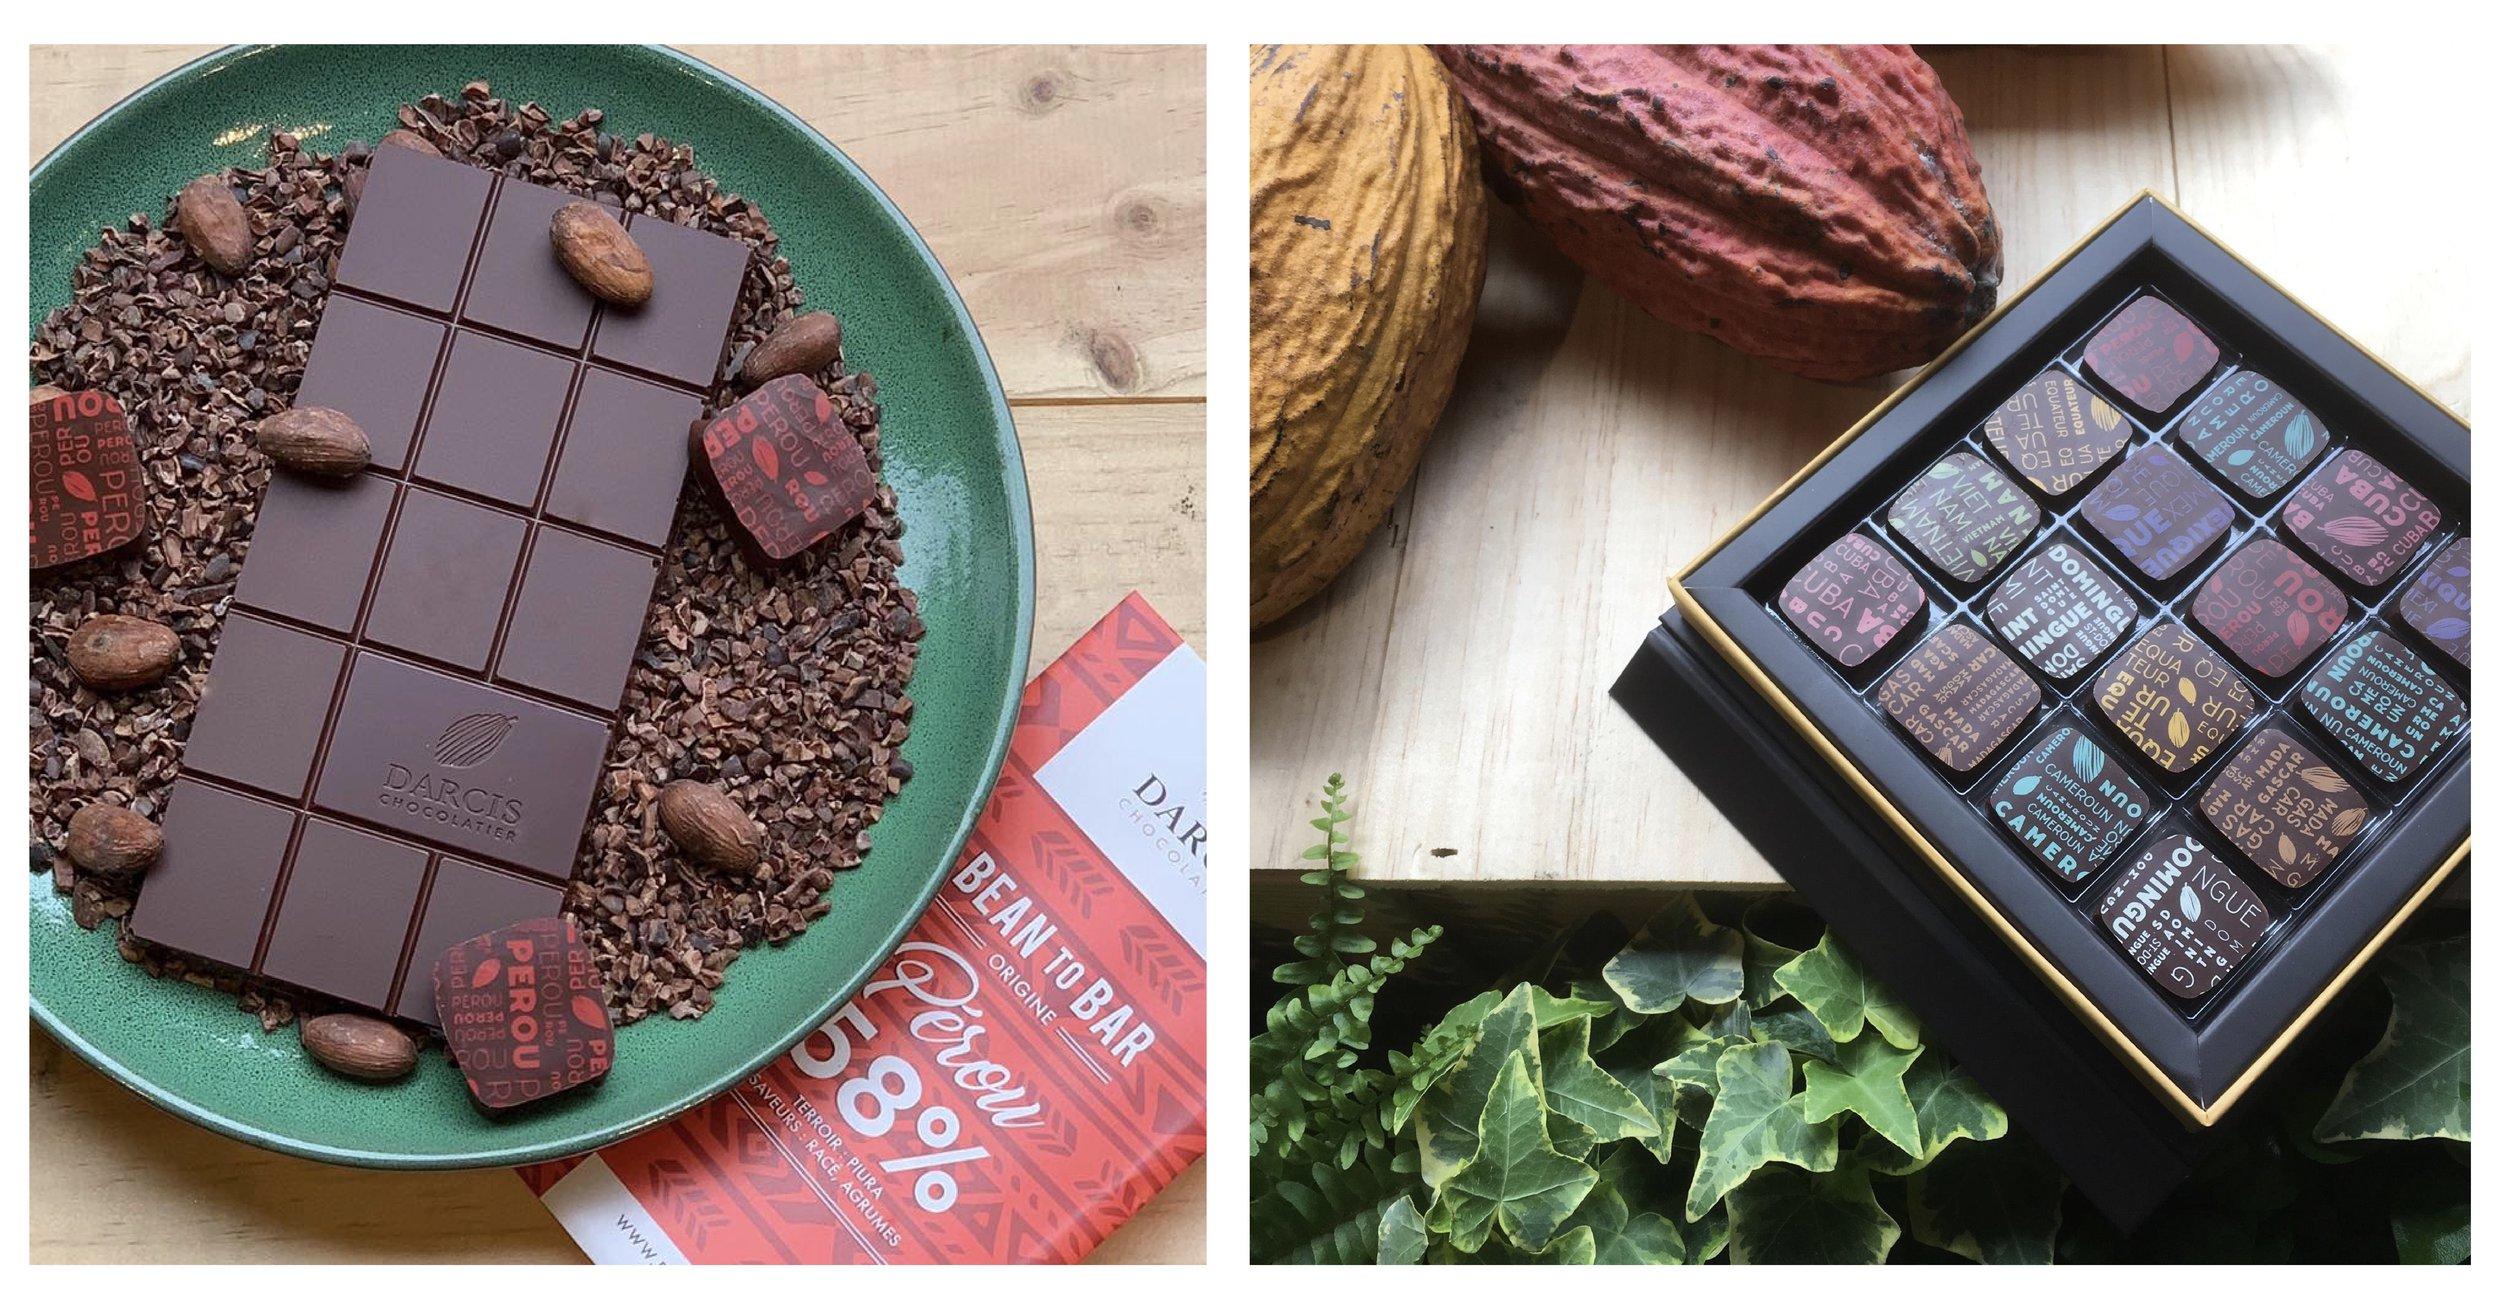 Darcis Chocolatier 將巧克力分為兩大類:Bean-to-bar 莊園原豆巧克力片(圖左)及 Gourmet Bars 風味巧克力片(圖右)